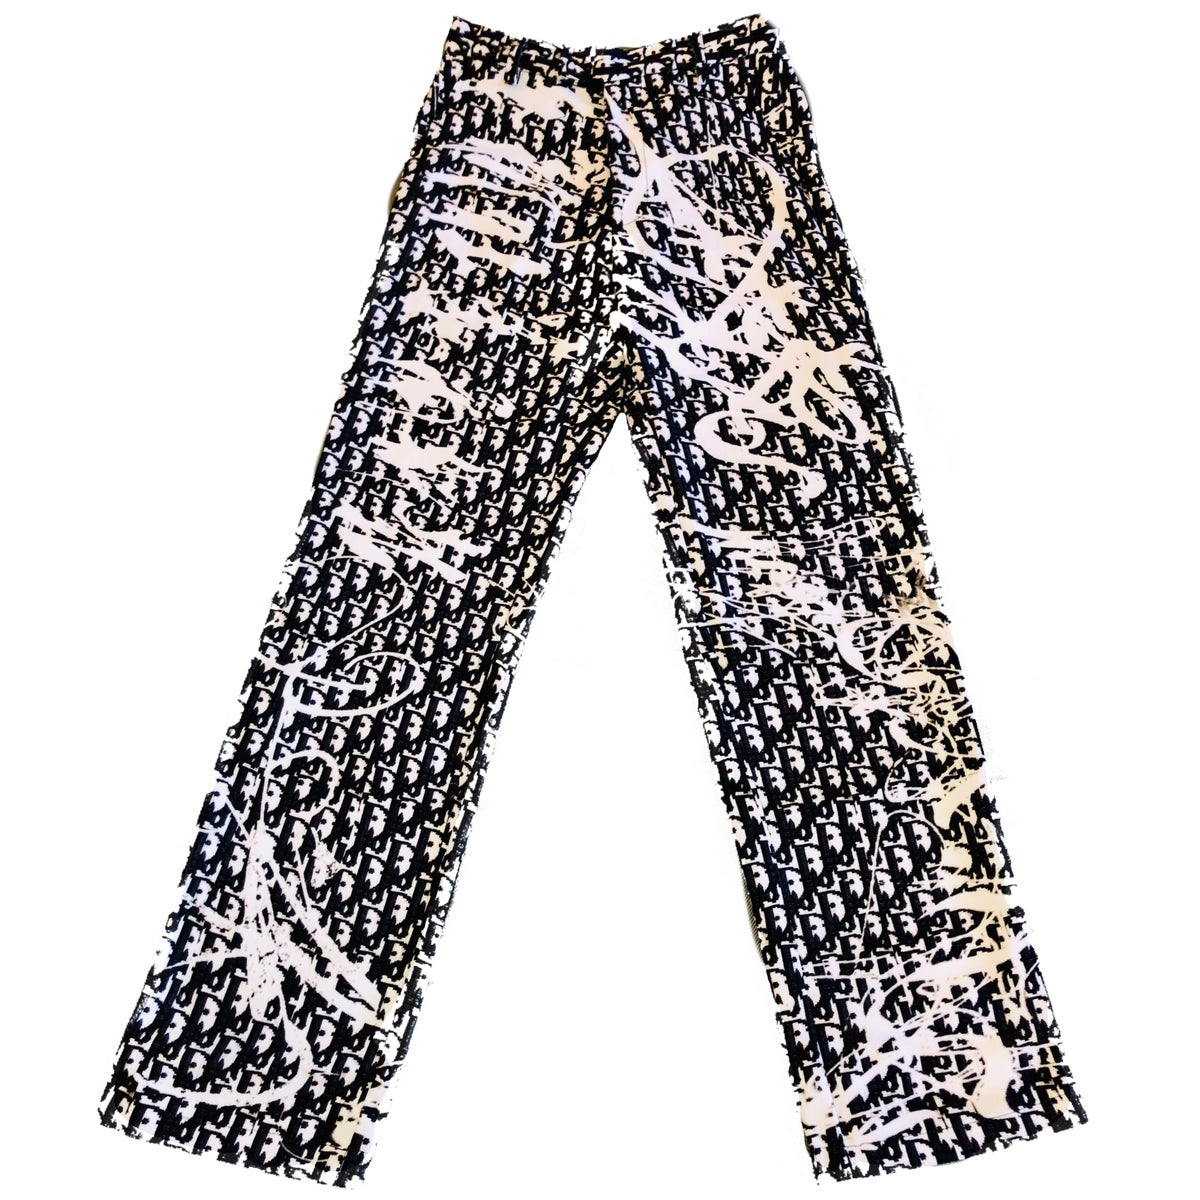 Image of Dioretti Pants